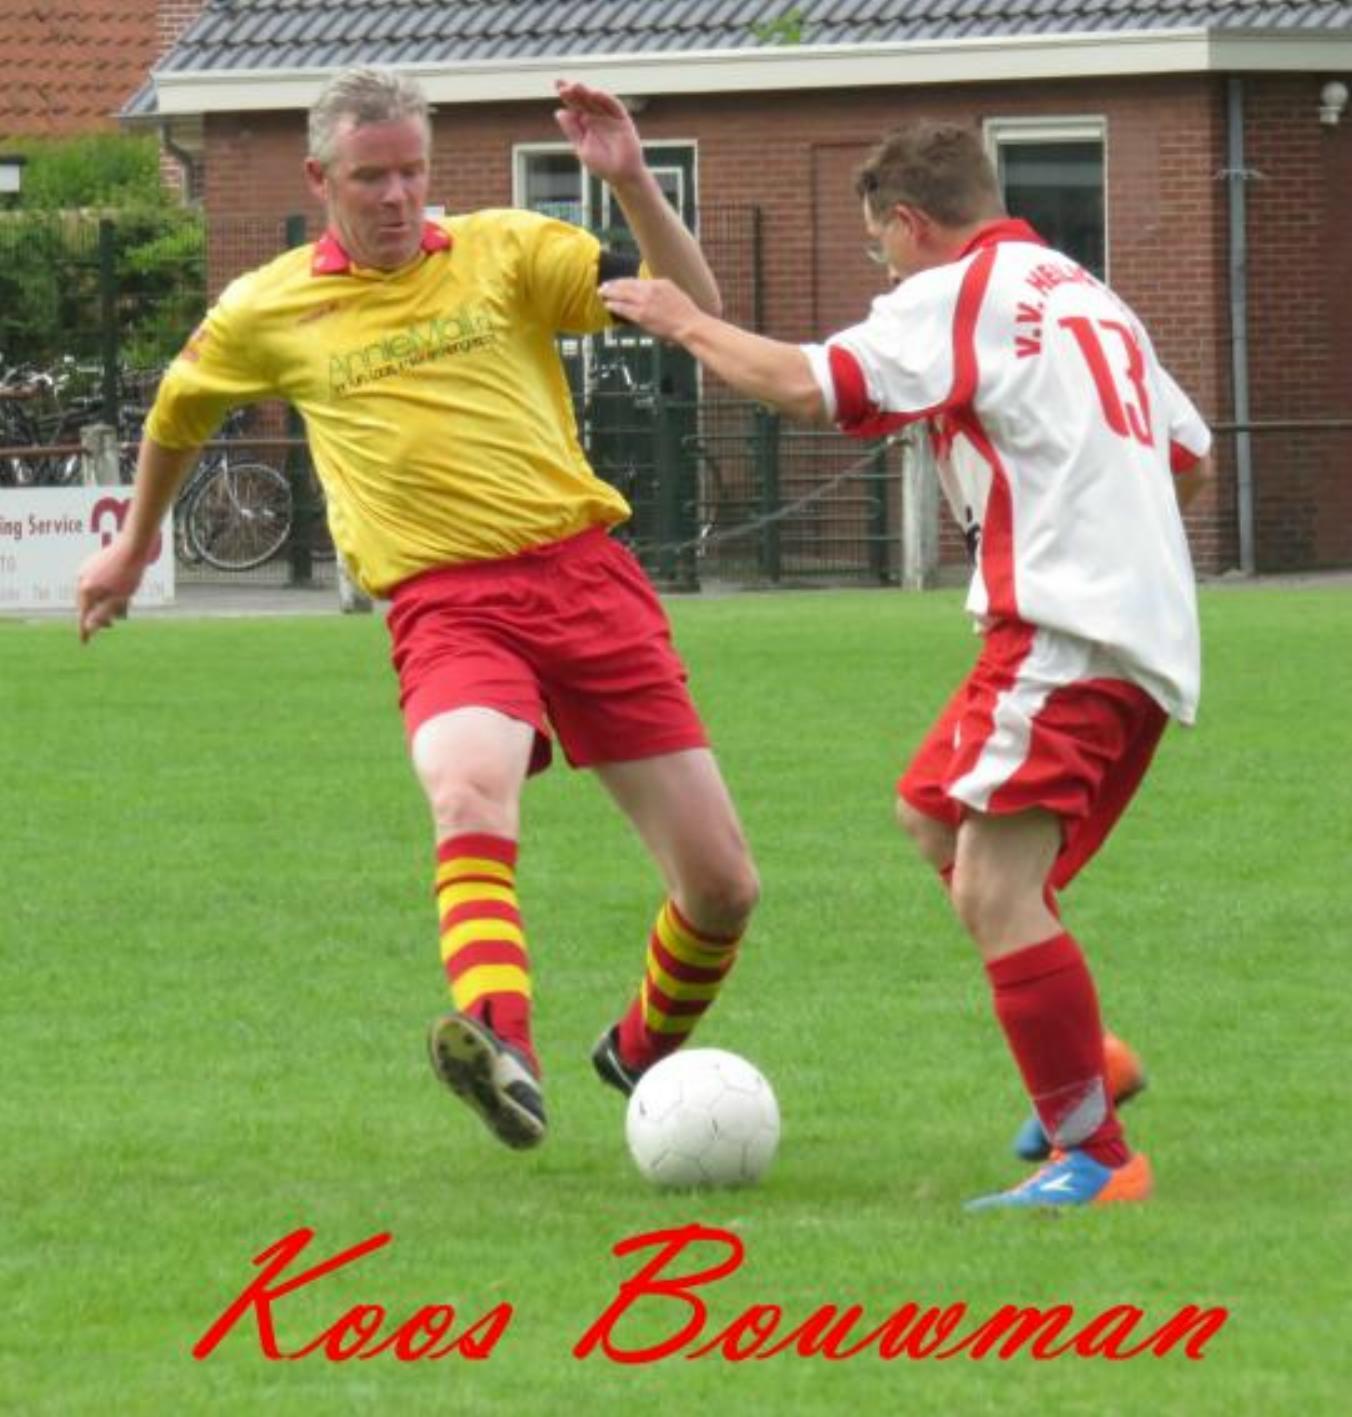 Koos-Bouwman